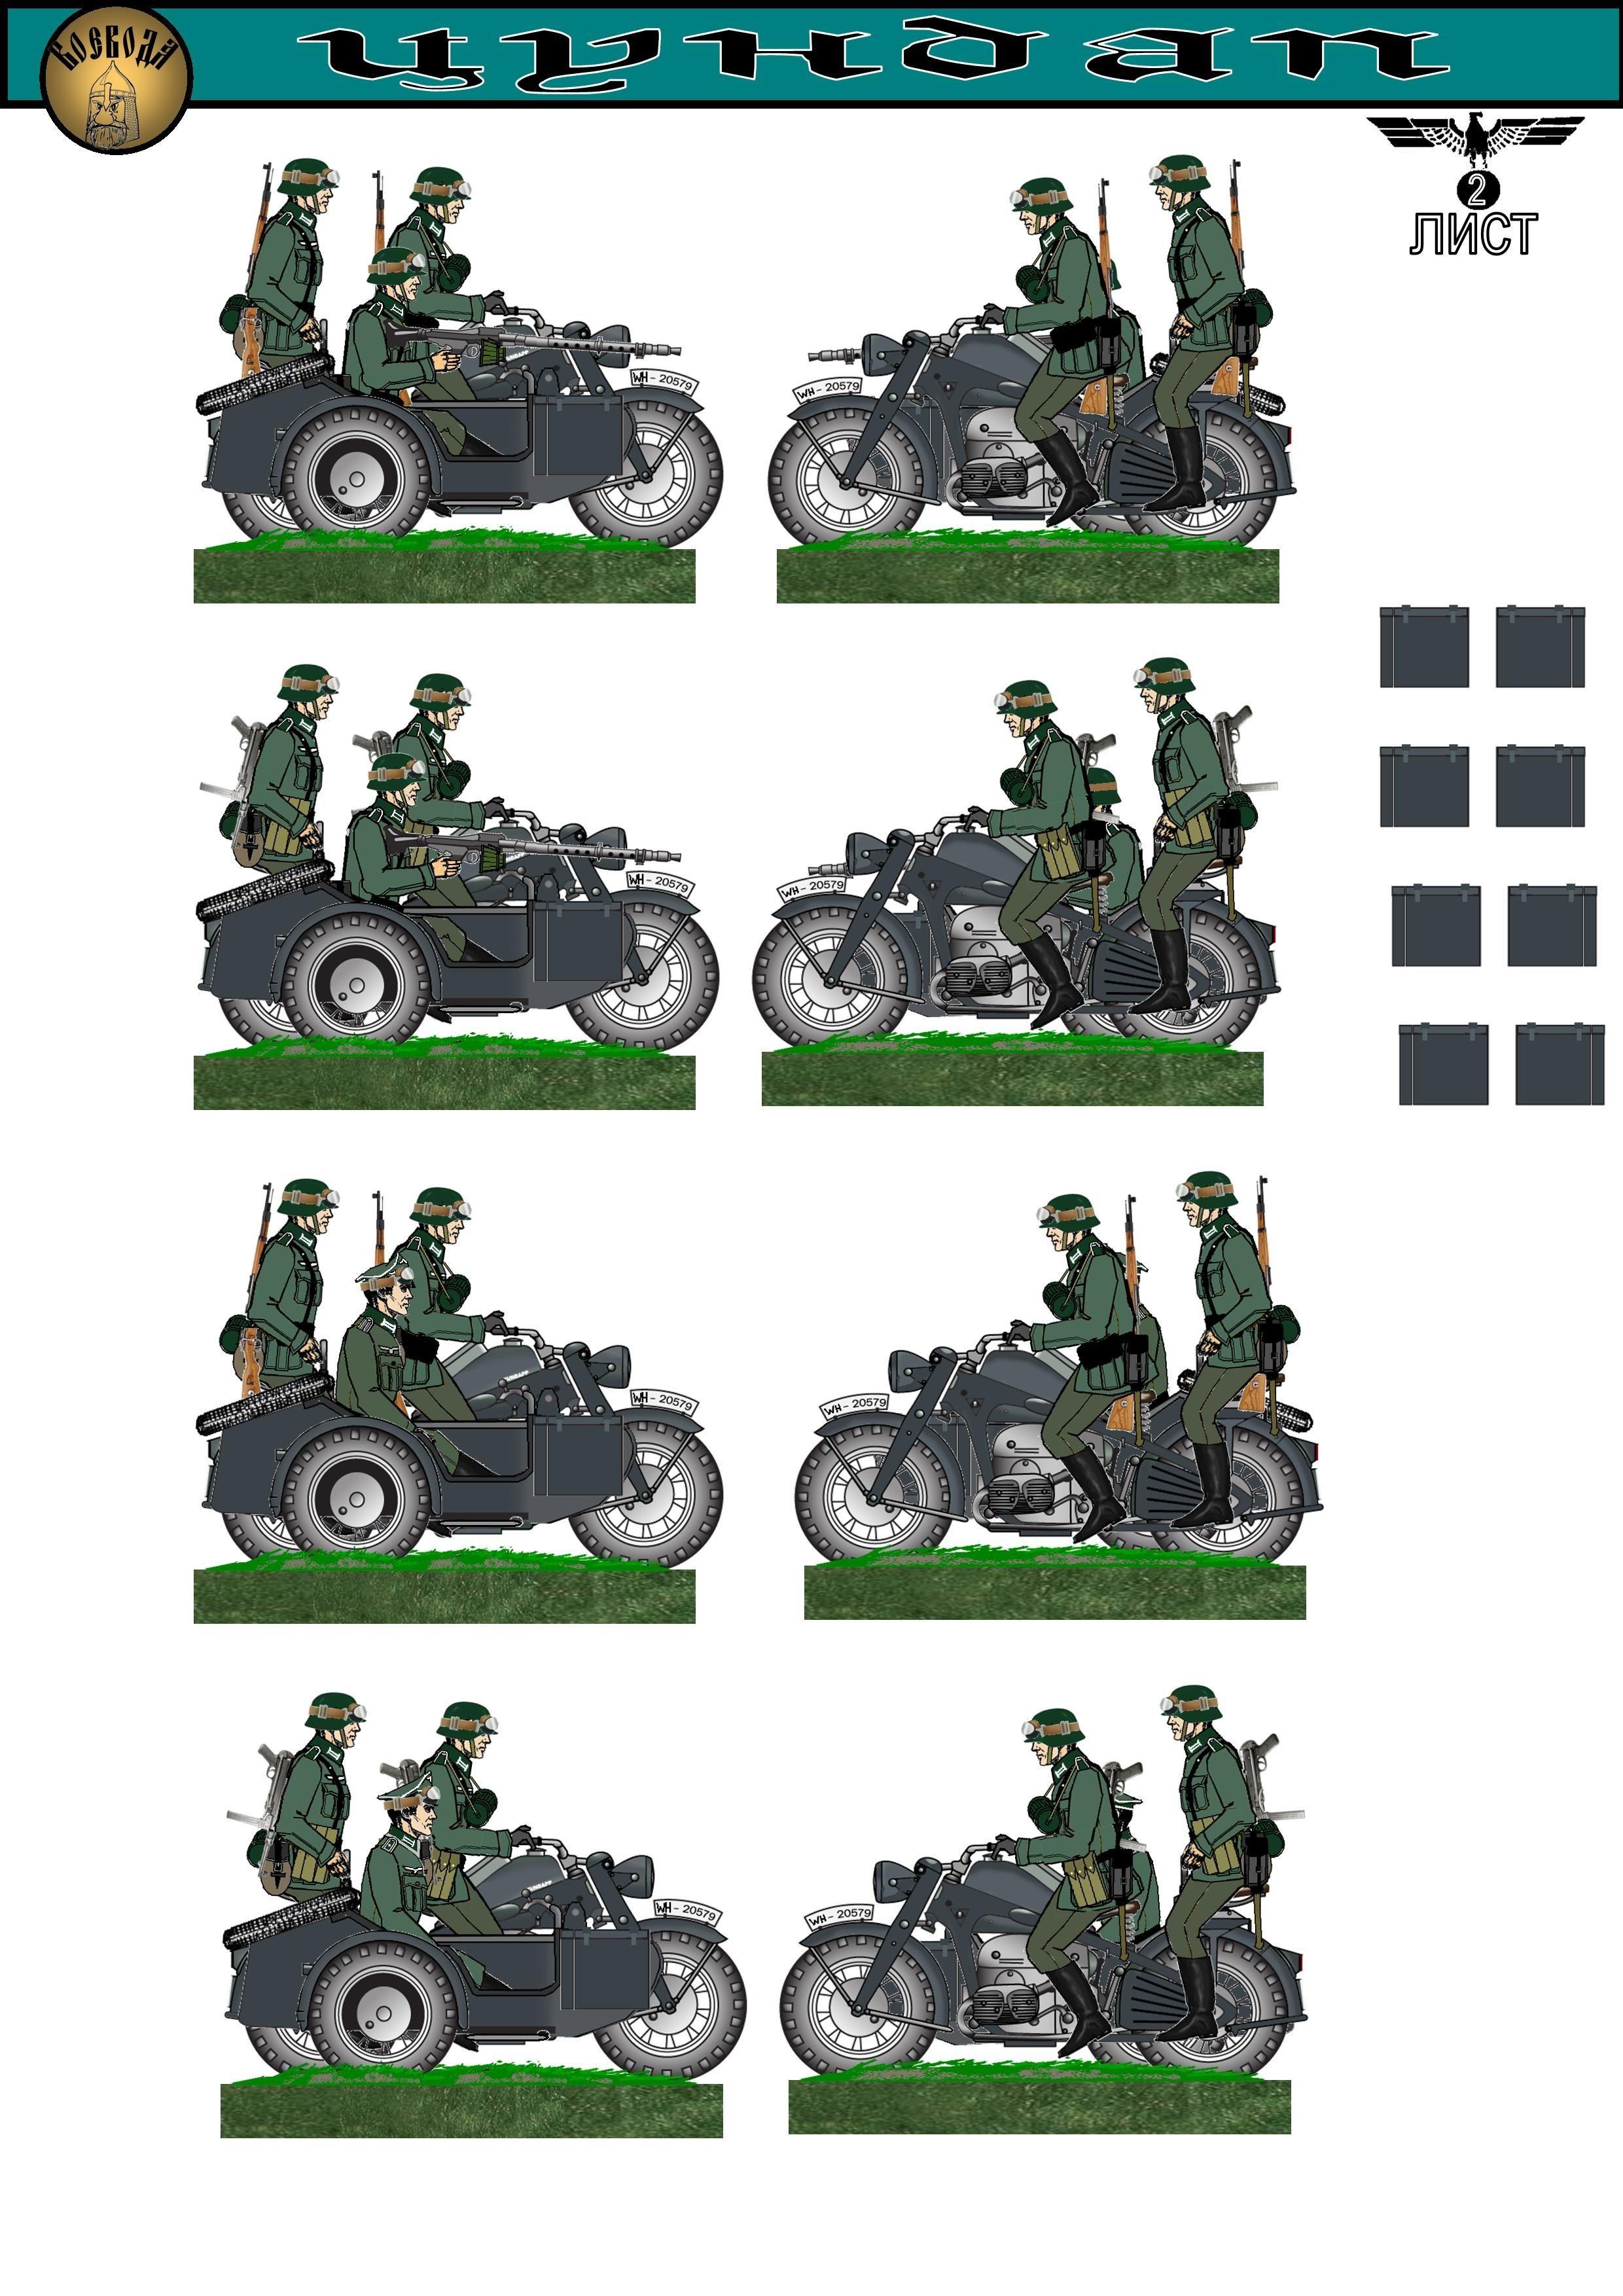 40k Papercraft Image Result for Warhammer 40k Papercraft Terrain